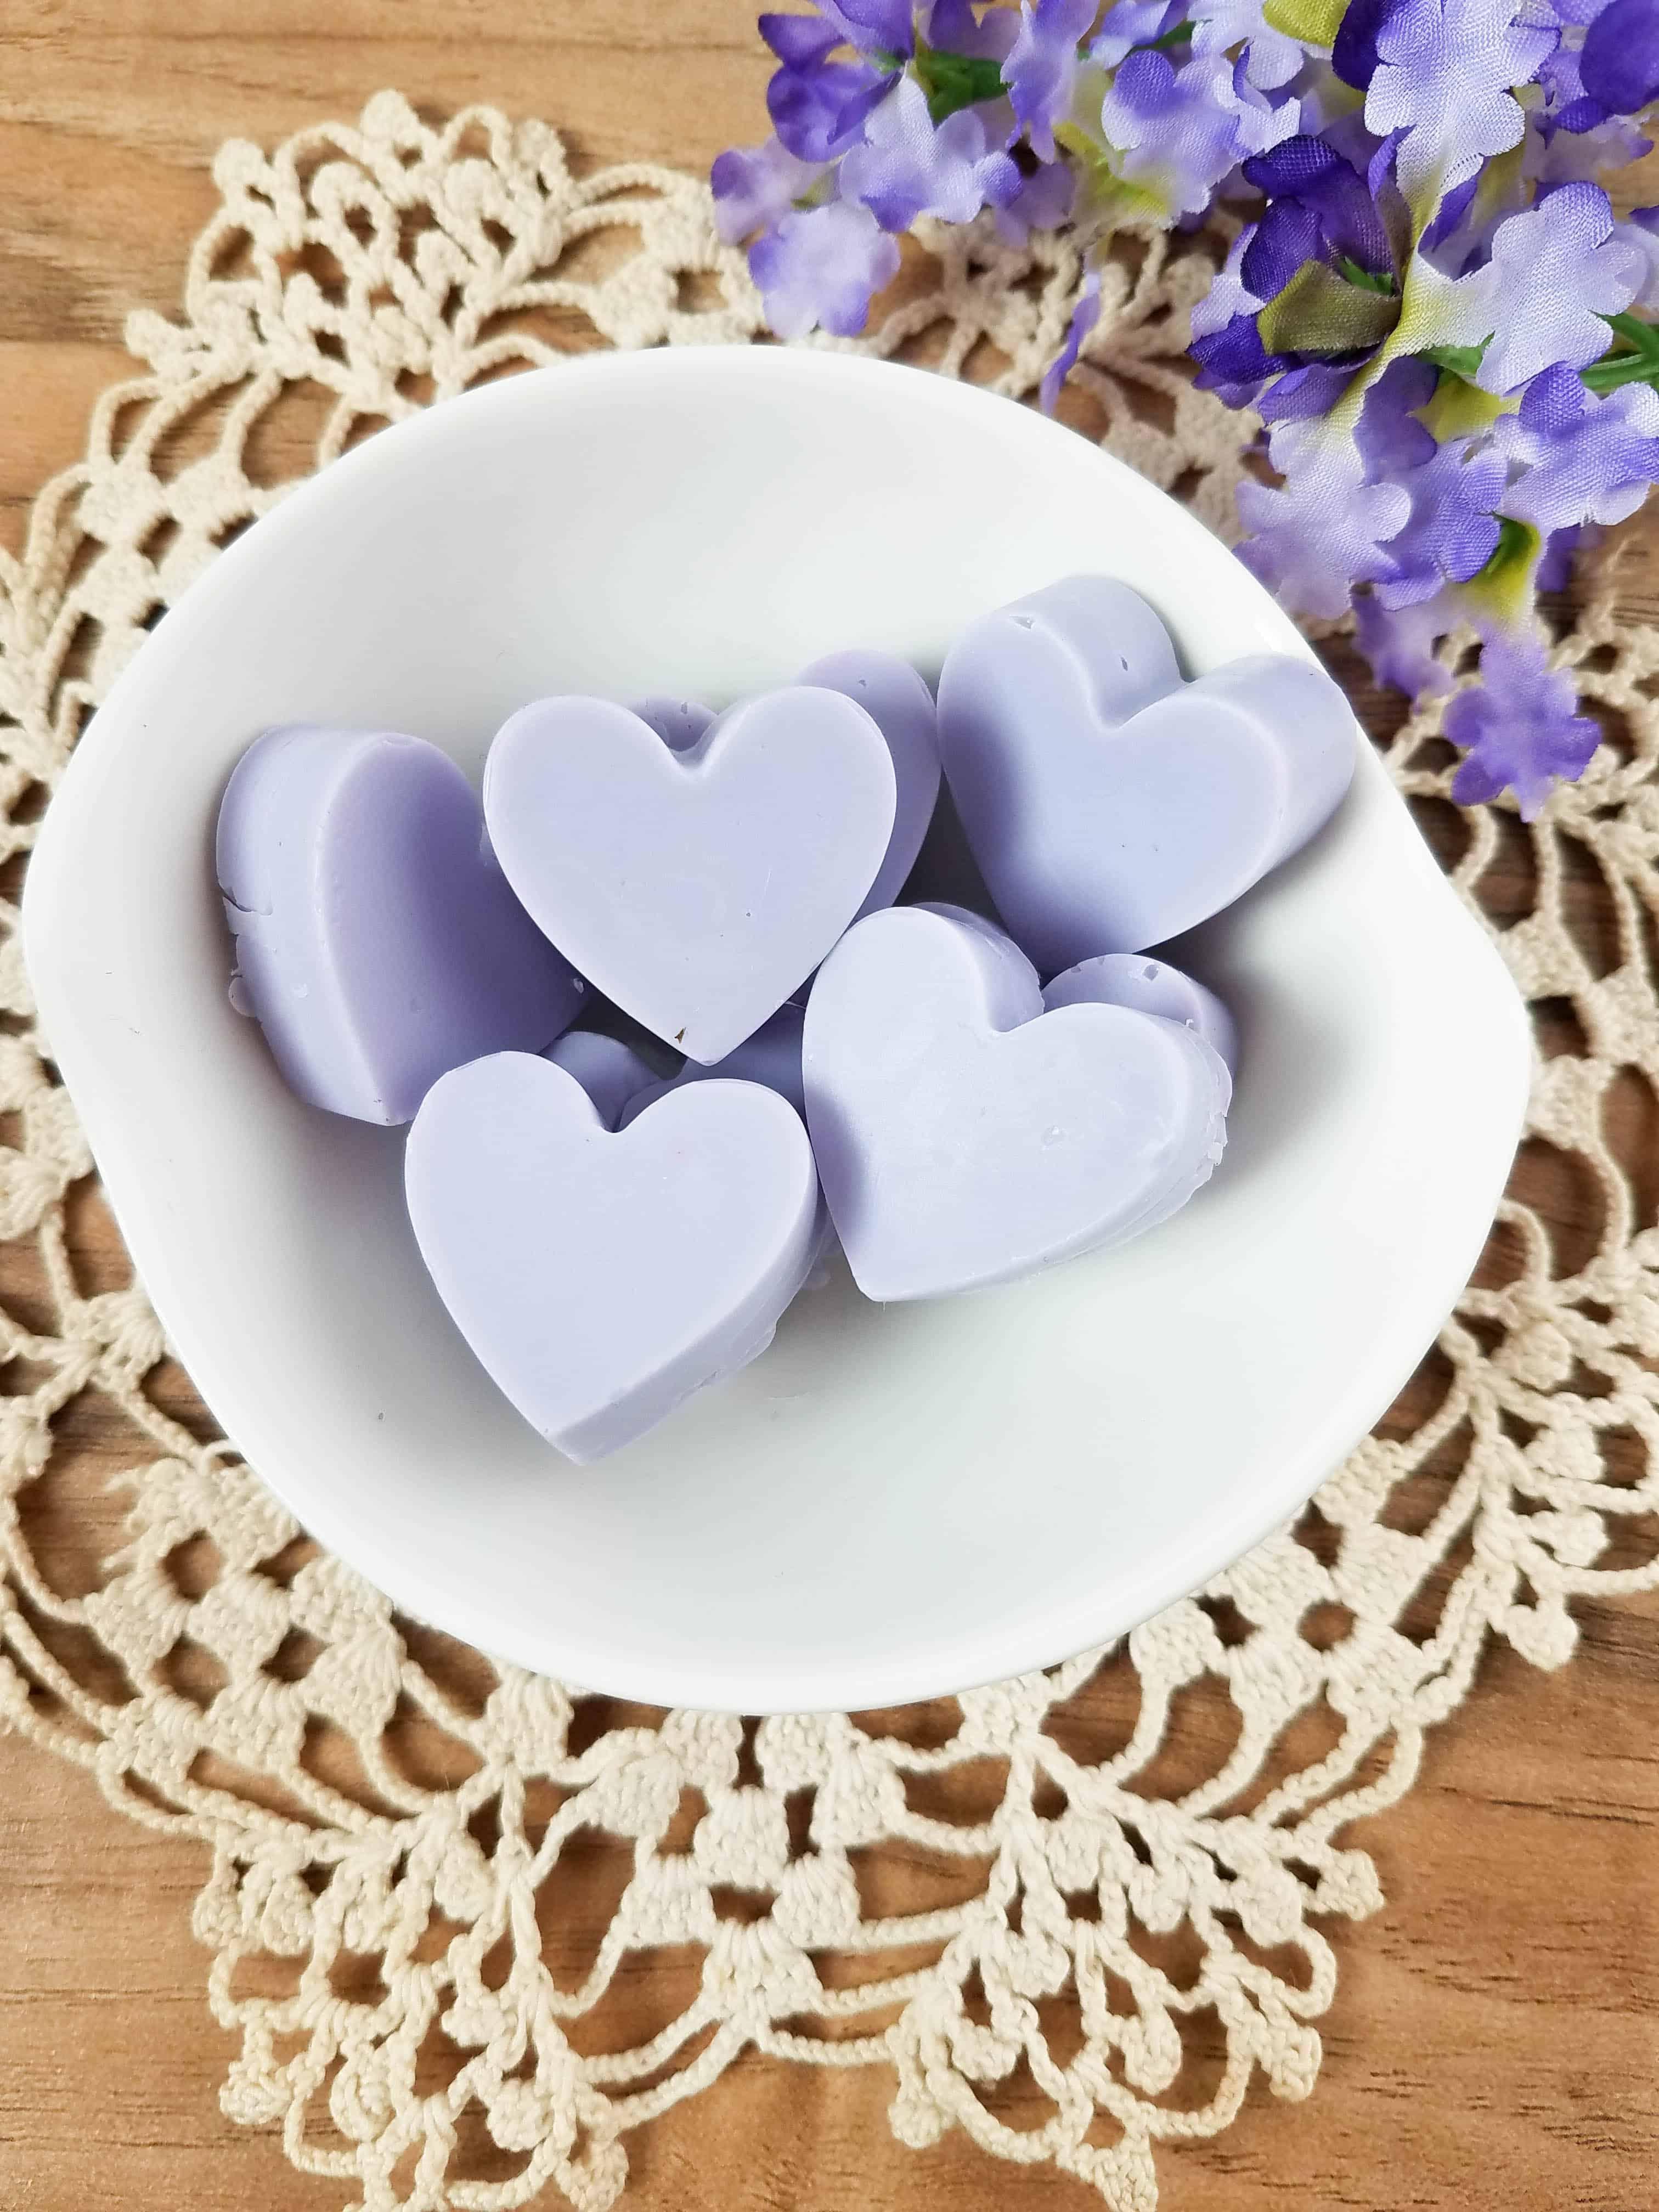 Homemade Lavender Soap Recipe